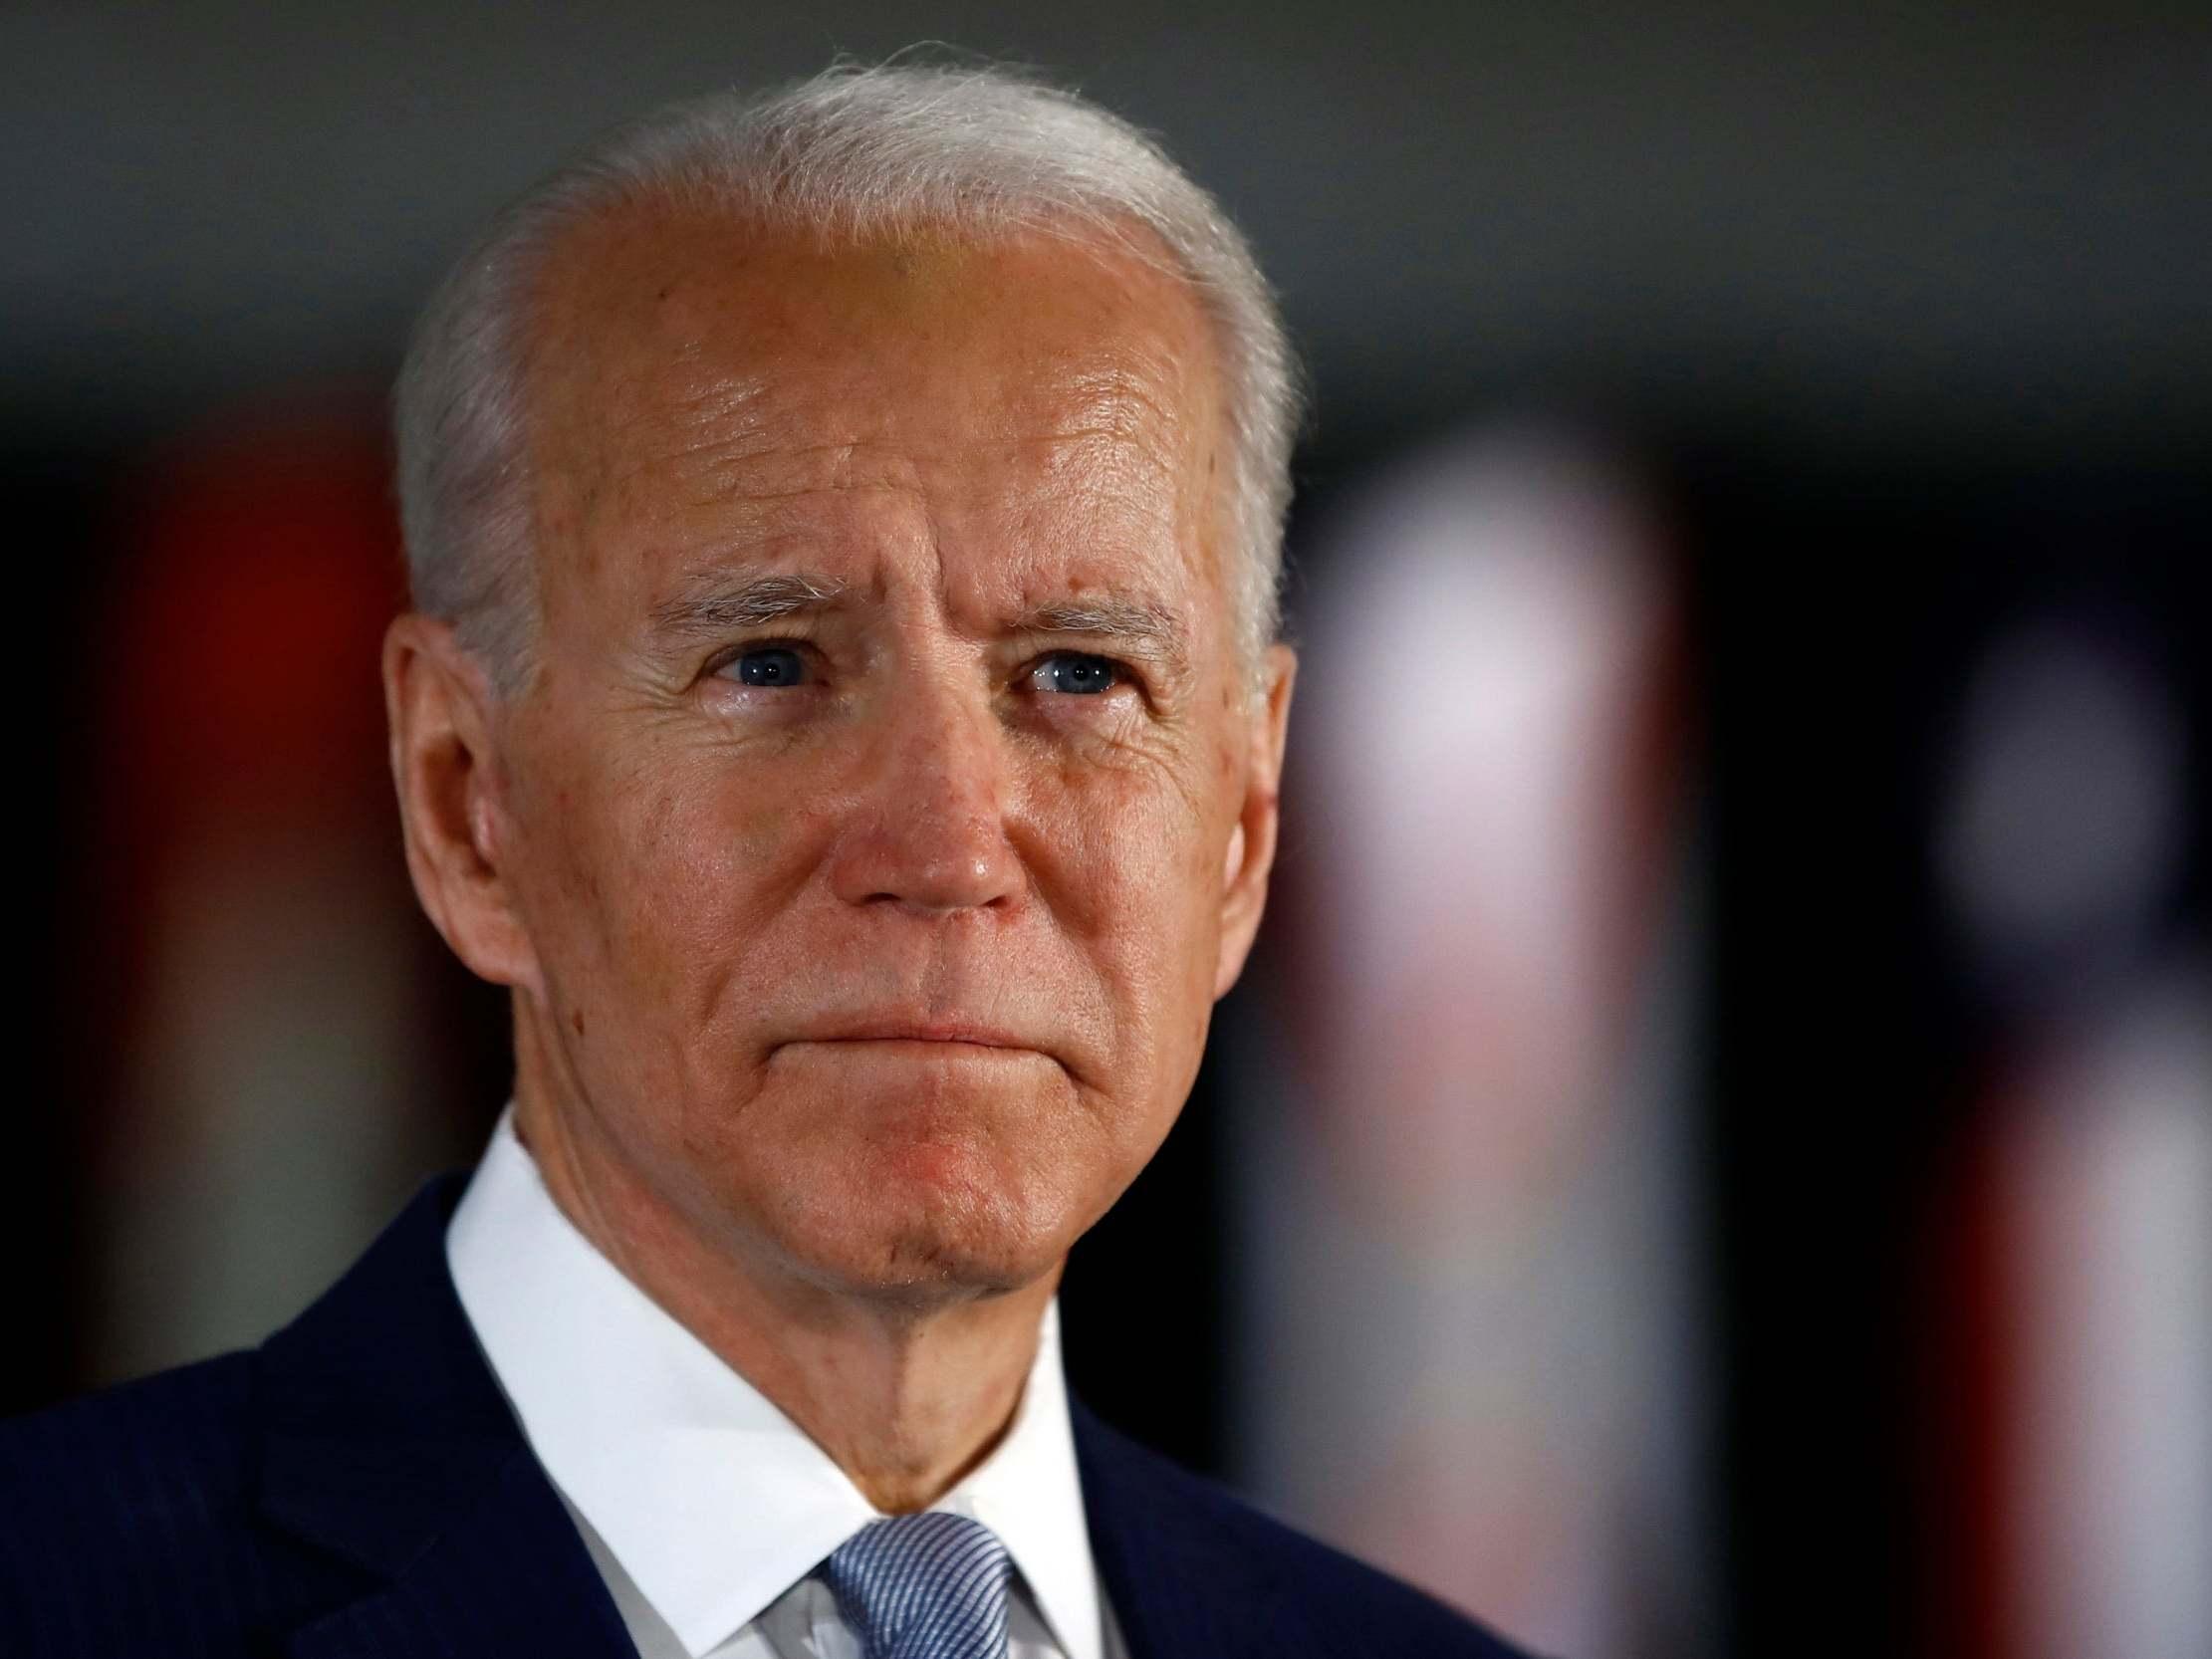 Joe Biden to publicly address Tara Reade sexual assault claims photo